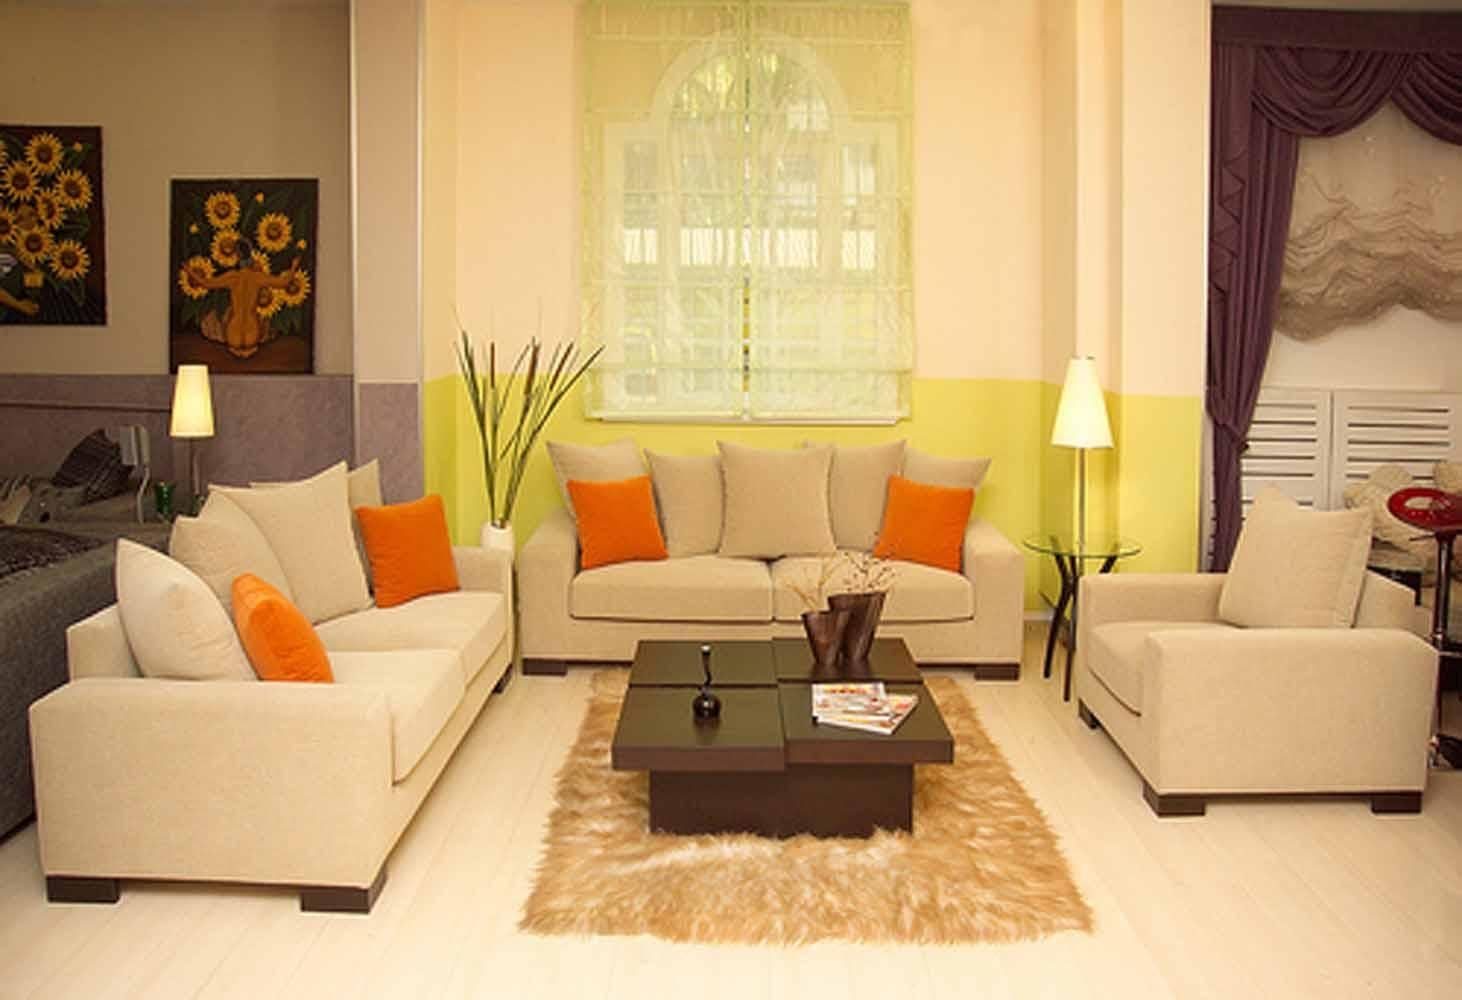 Surprising Furniture For Living Room Design – Living Room Throughout Living Room Sofa Chairs (View 11 of 20)